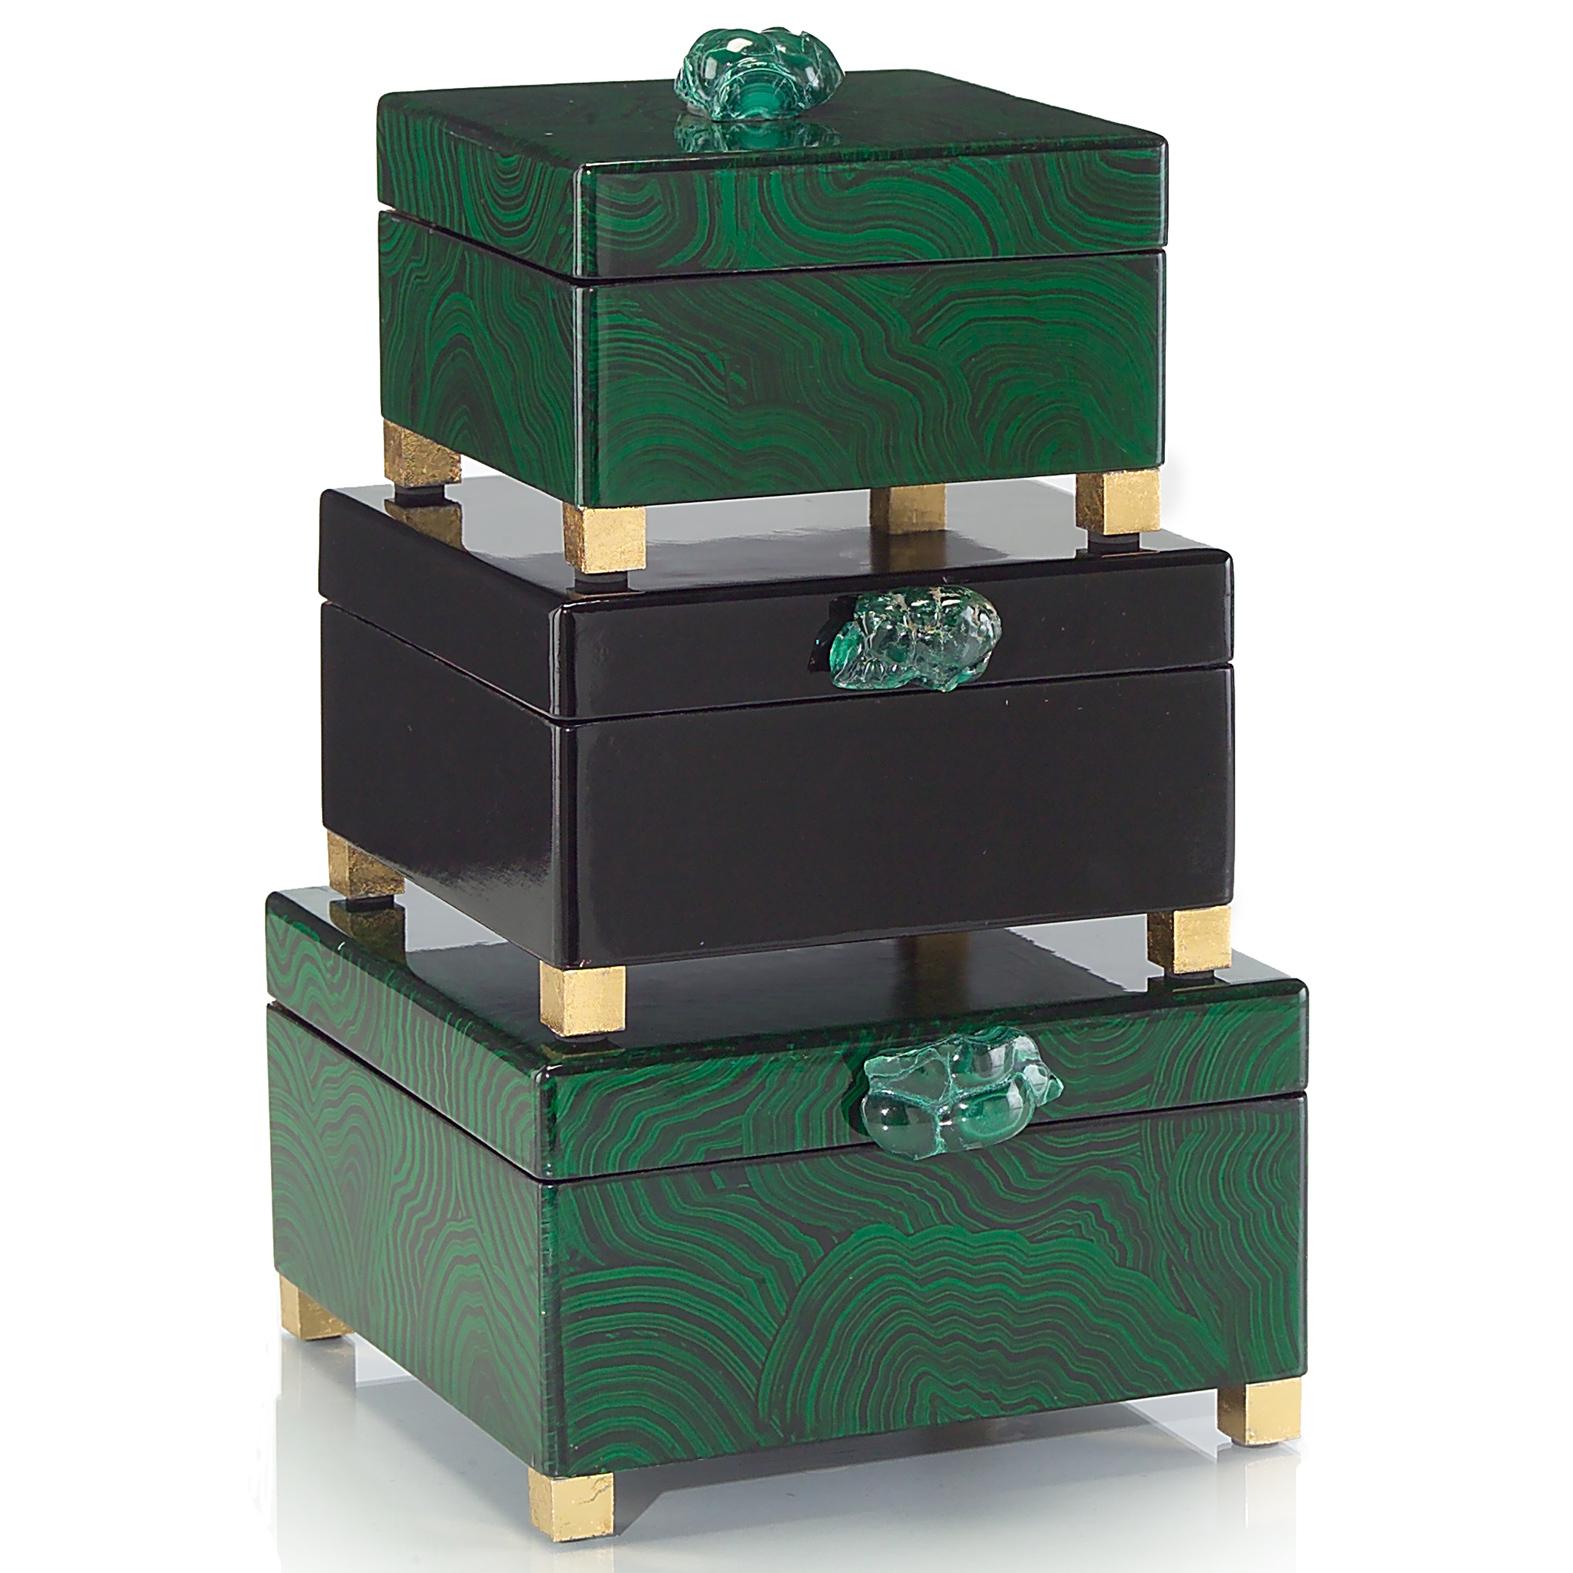 Bridget Hollywood Regency Malachite Green Black Lacquer Boxes - Set of 3